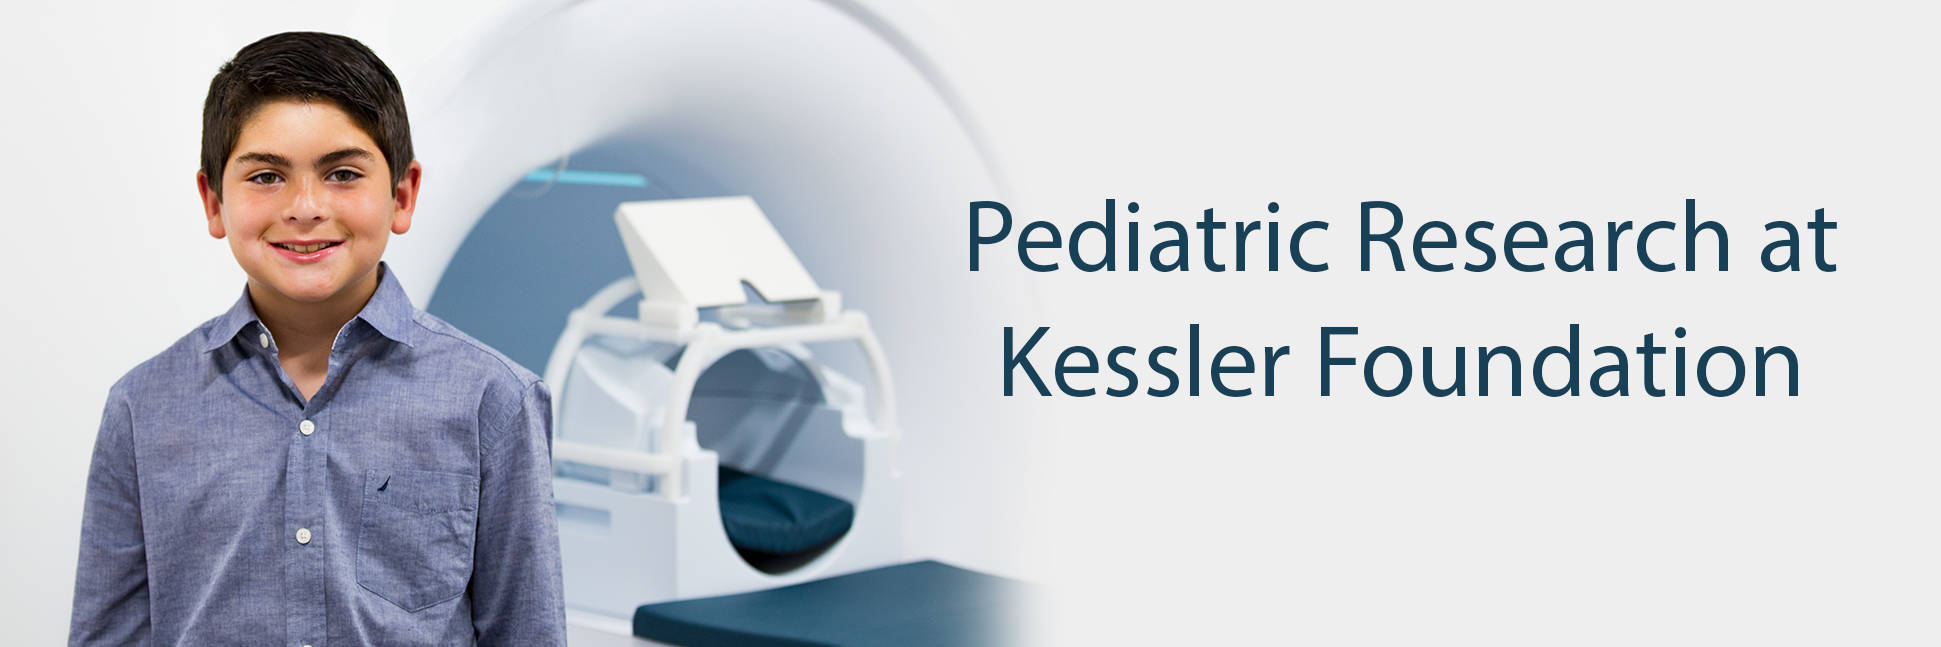 Pediatric_Research_Hero.jpg